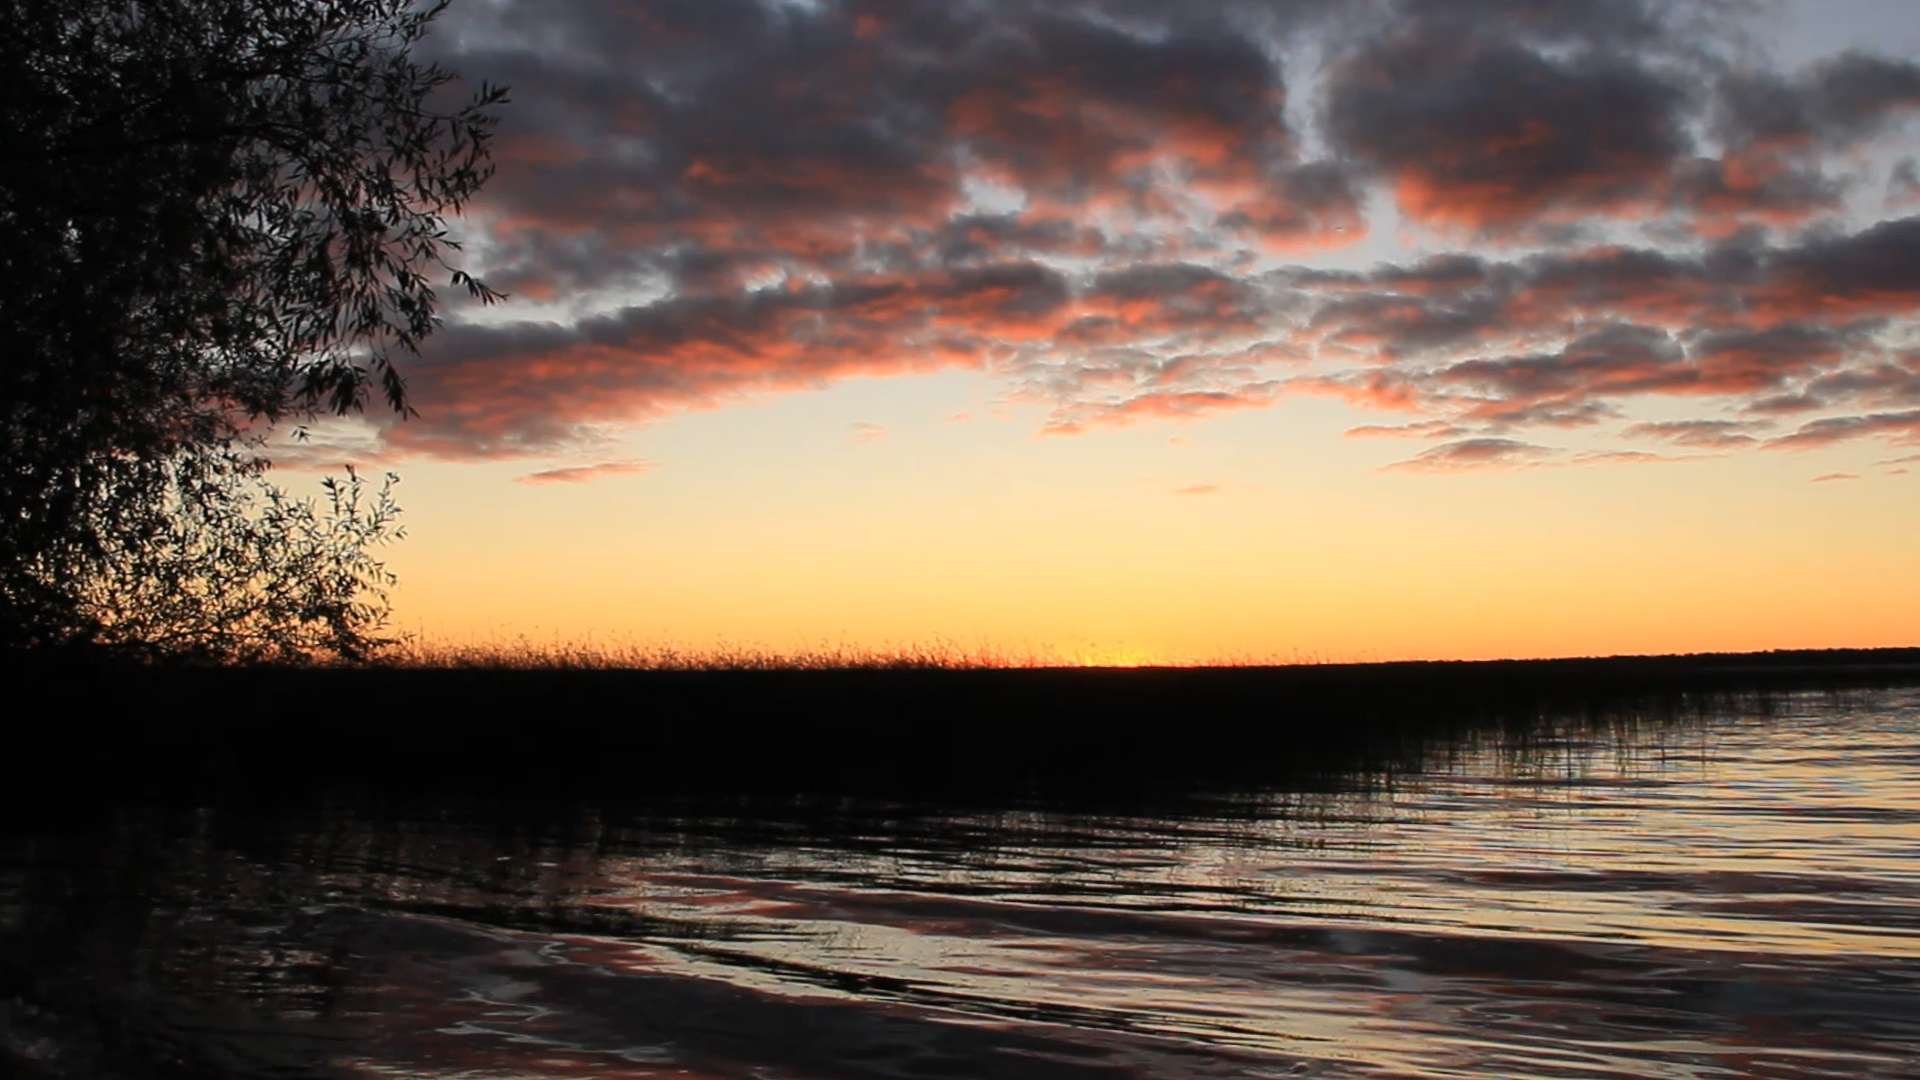 Sunset on Otter Tail Lake